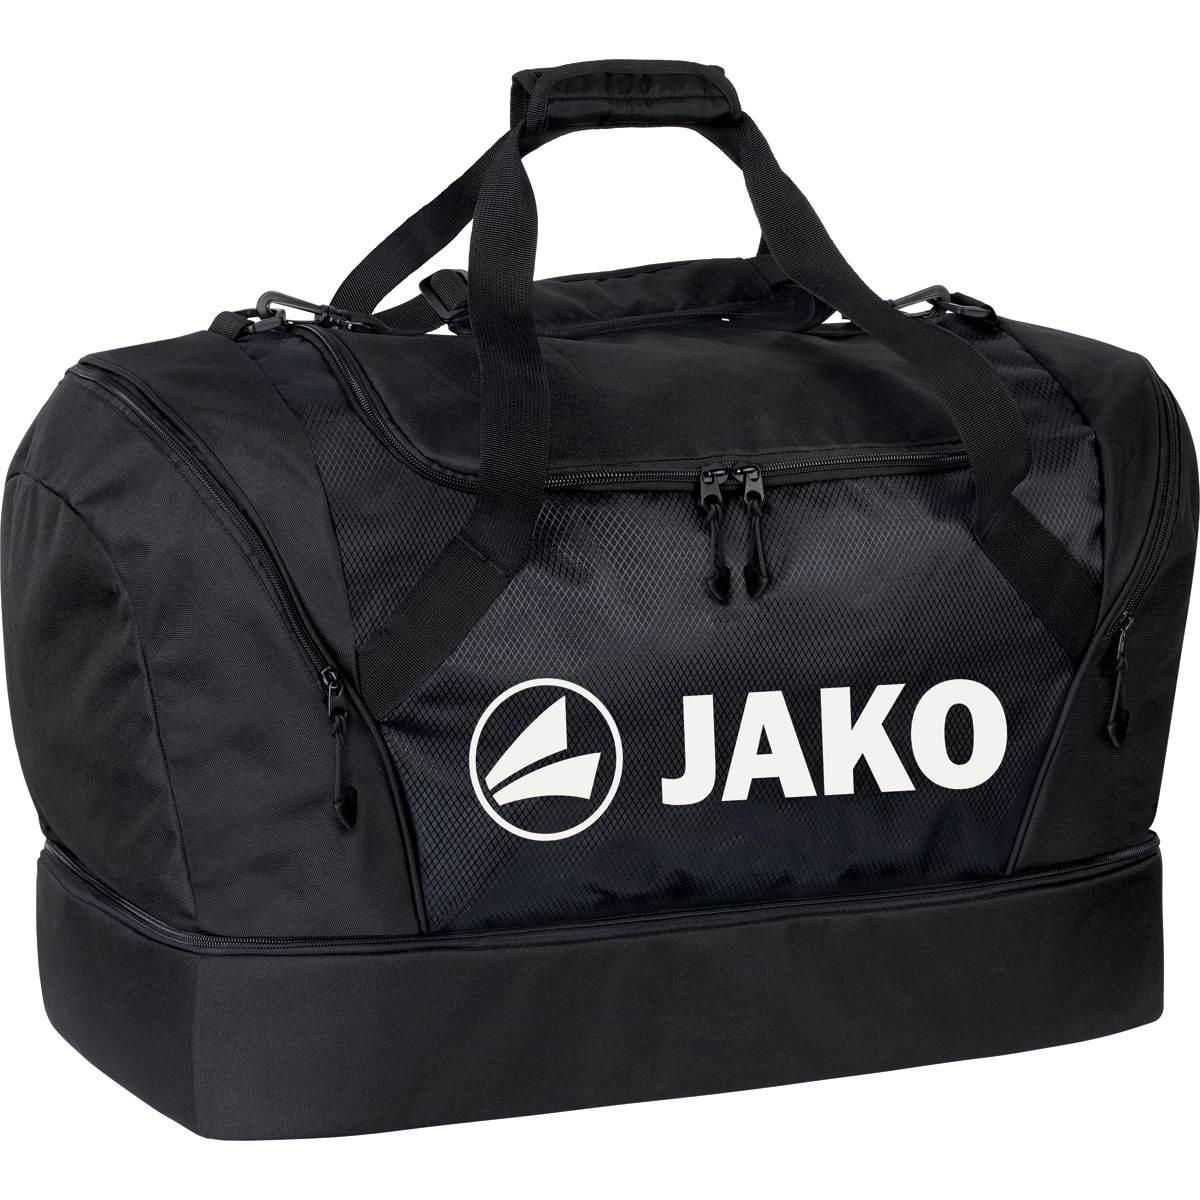 "JAKO Sporttasche ""JAKO"" - schwarz - Größe L"